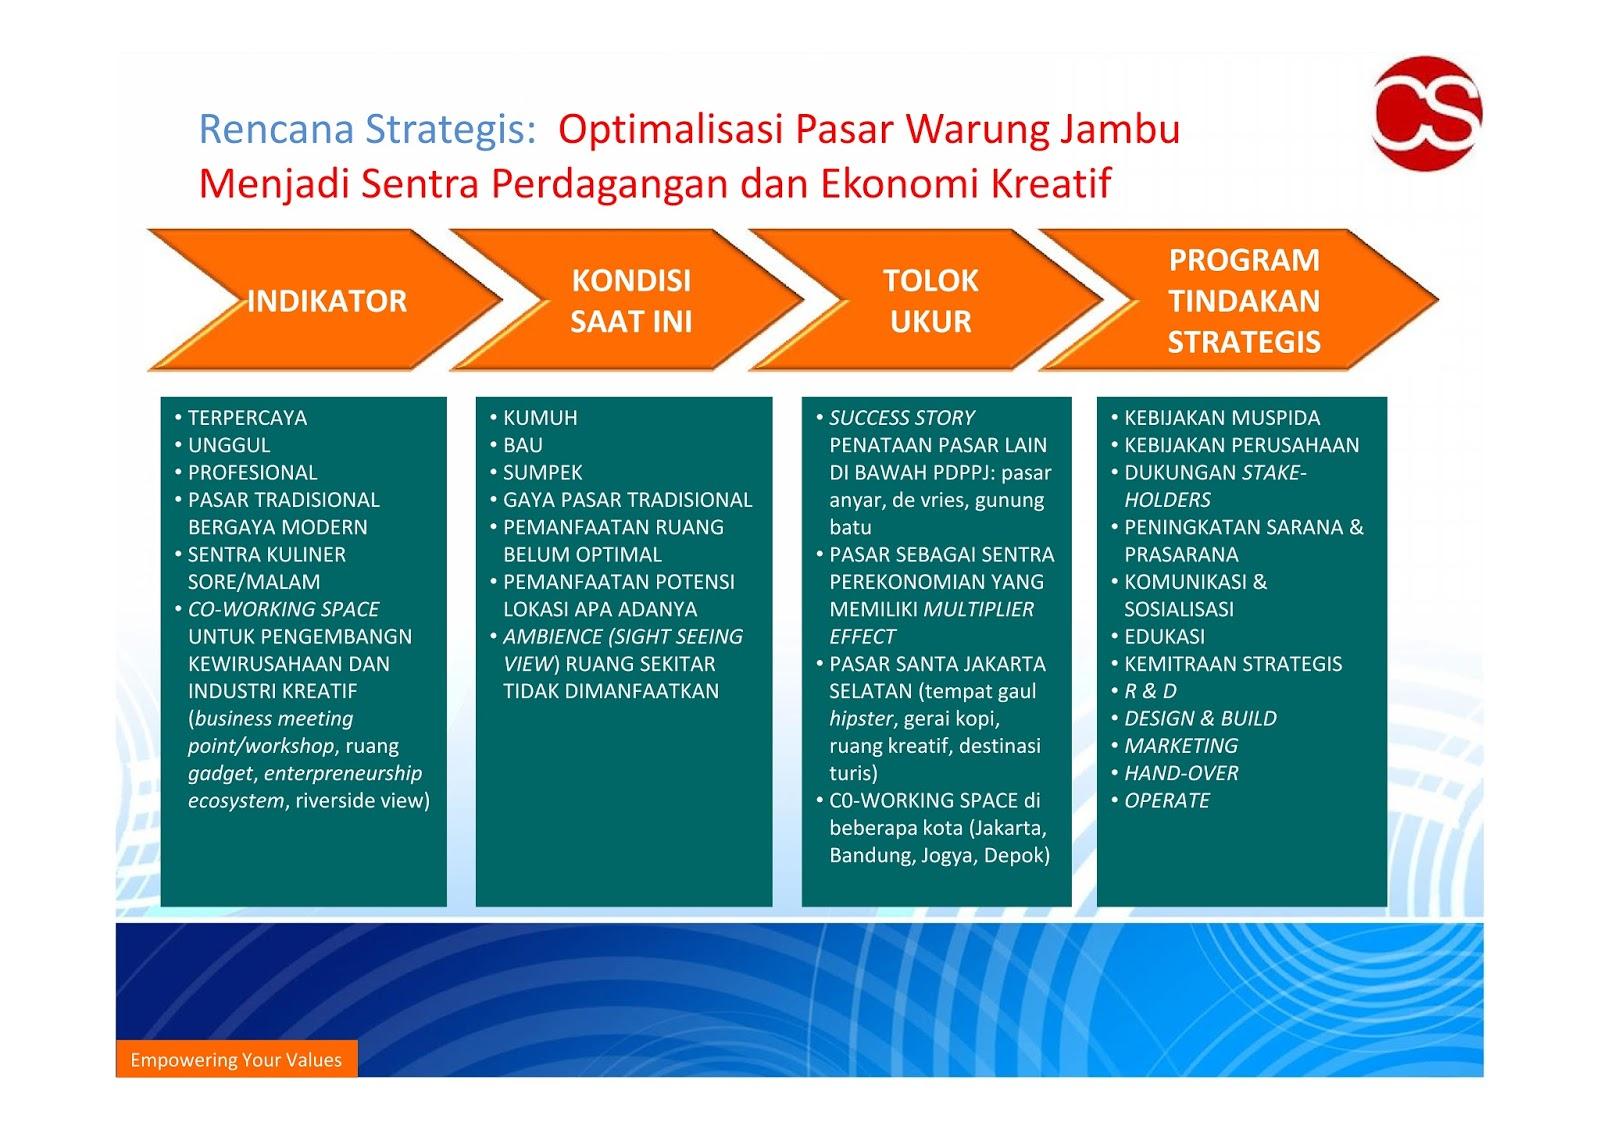 strategi perdagangan profesional pasar atas